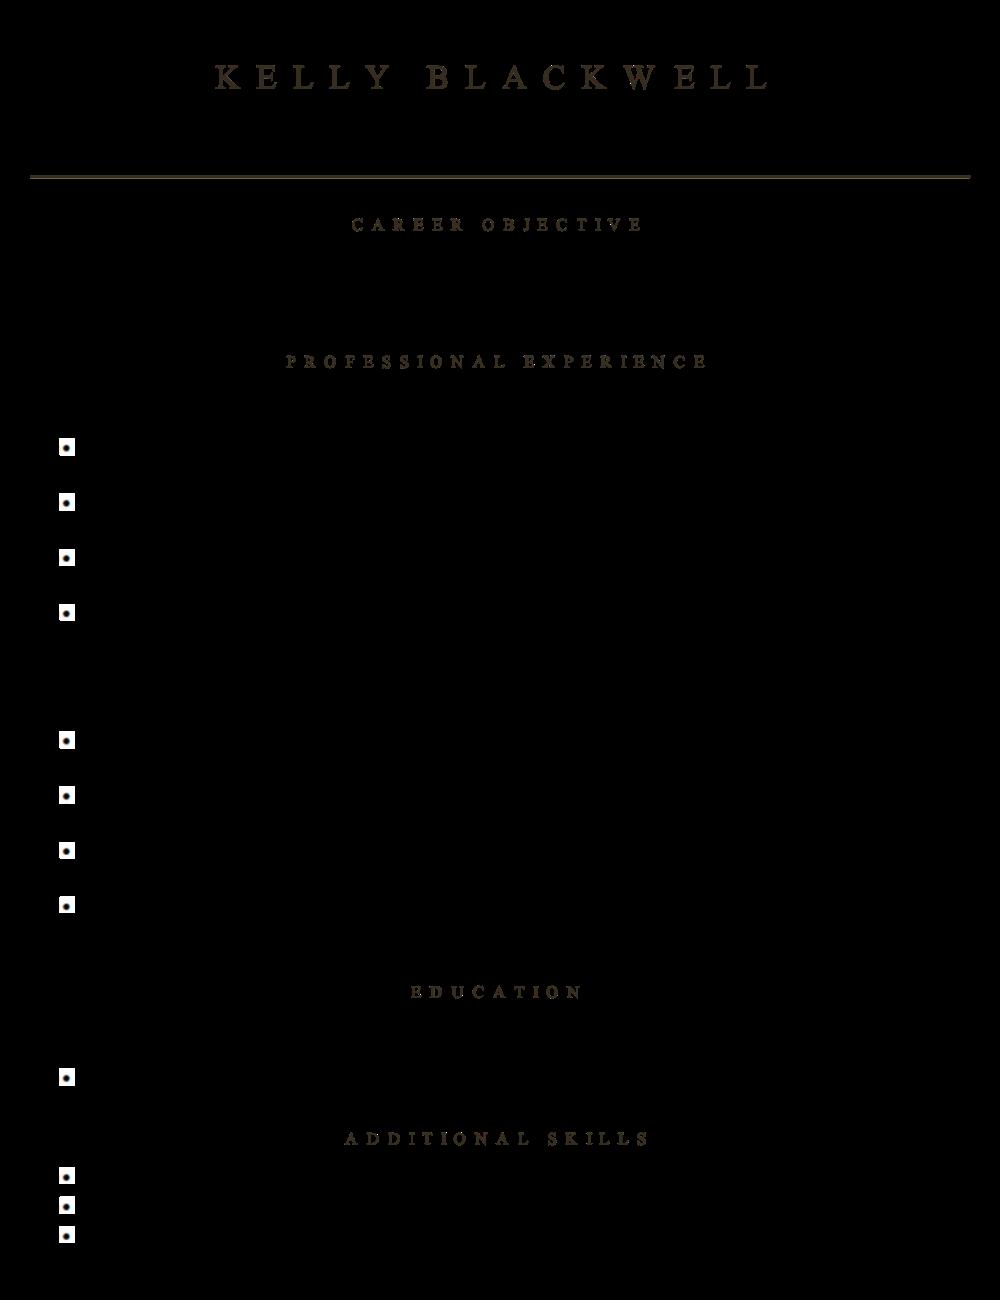 Resume Builder in 2020 Resume builder, Resume